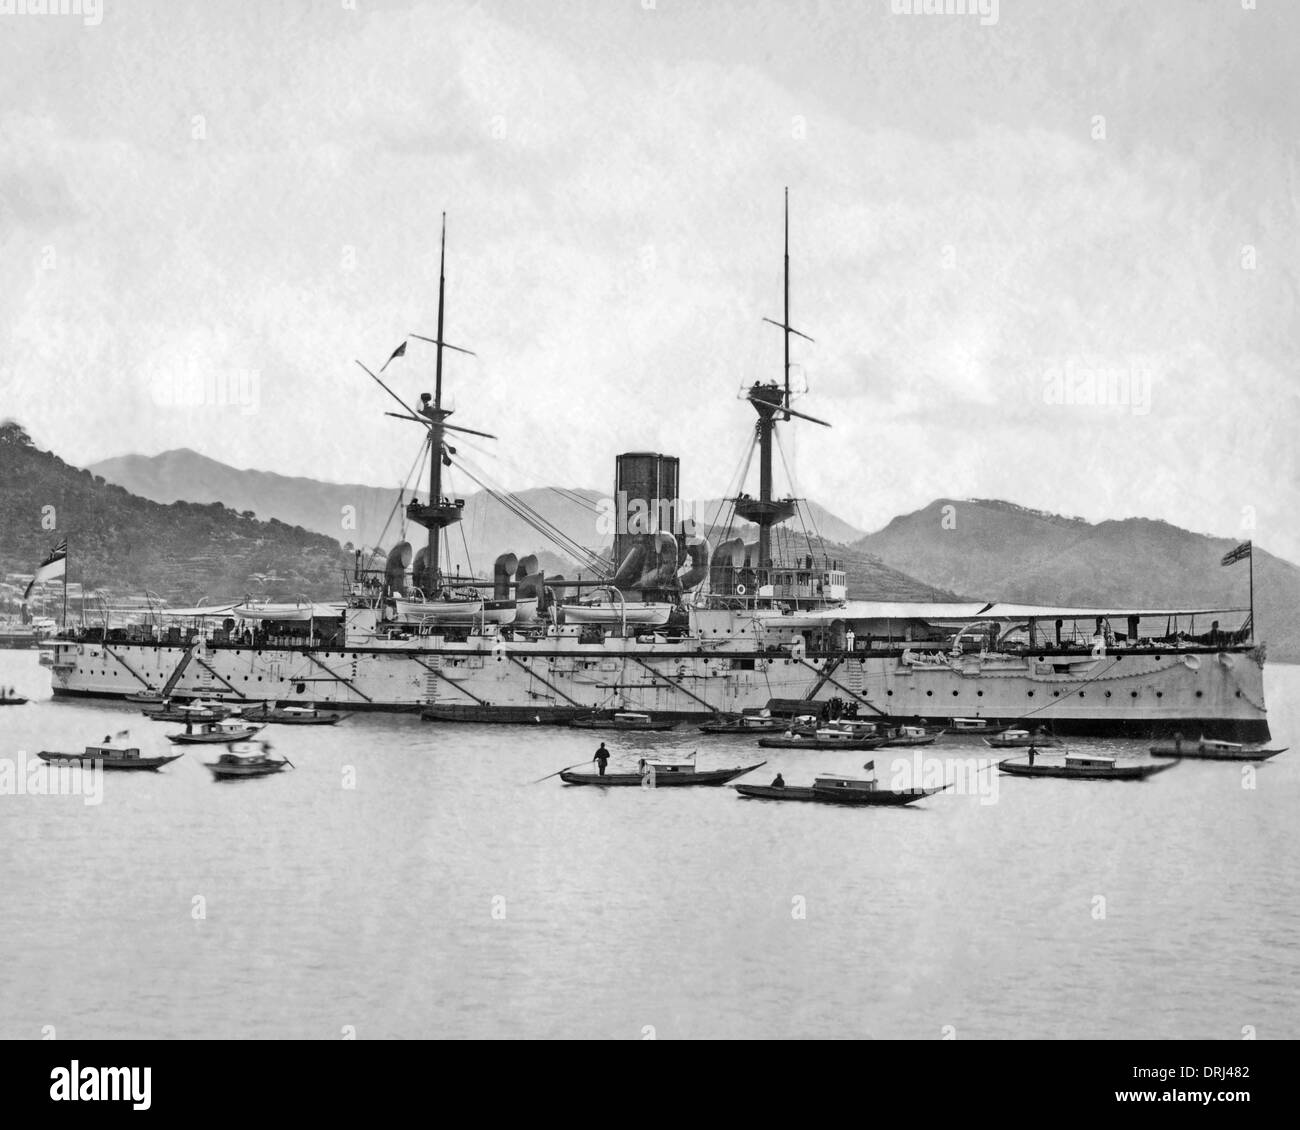 Ship in harbour, Hong Kong, China - Stock Image